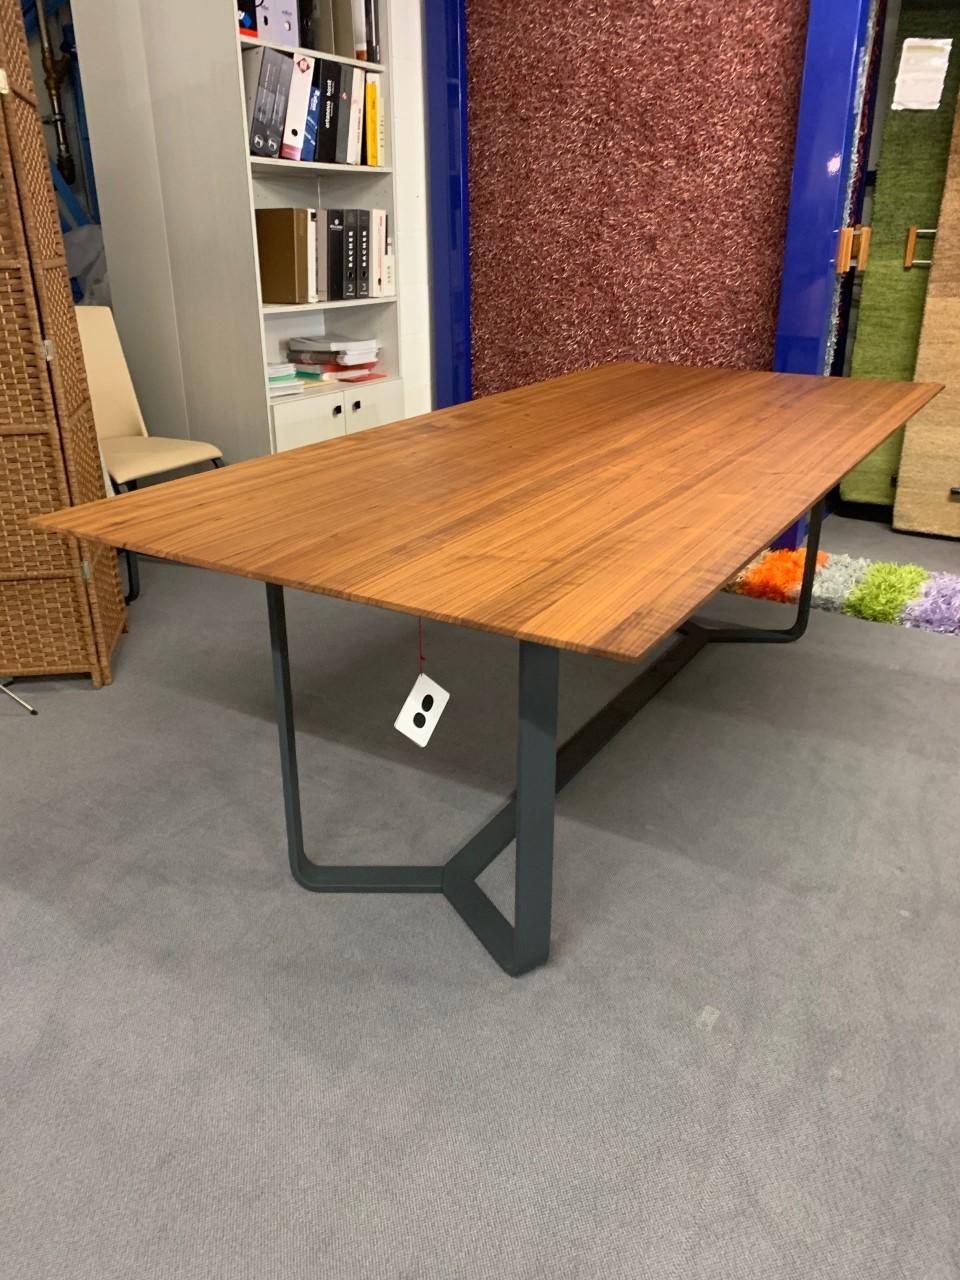 Tisch massiv Modell Yoho von Girsberger 100 x 220 cm 01